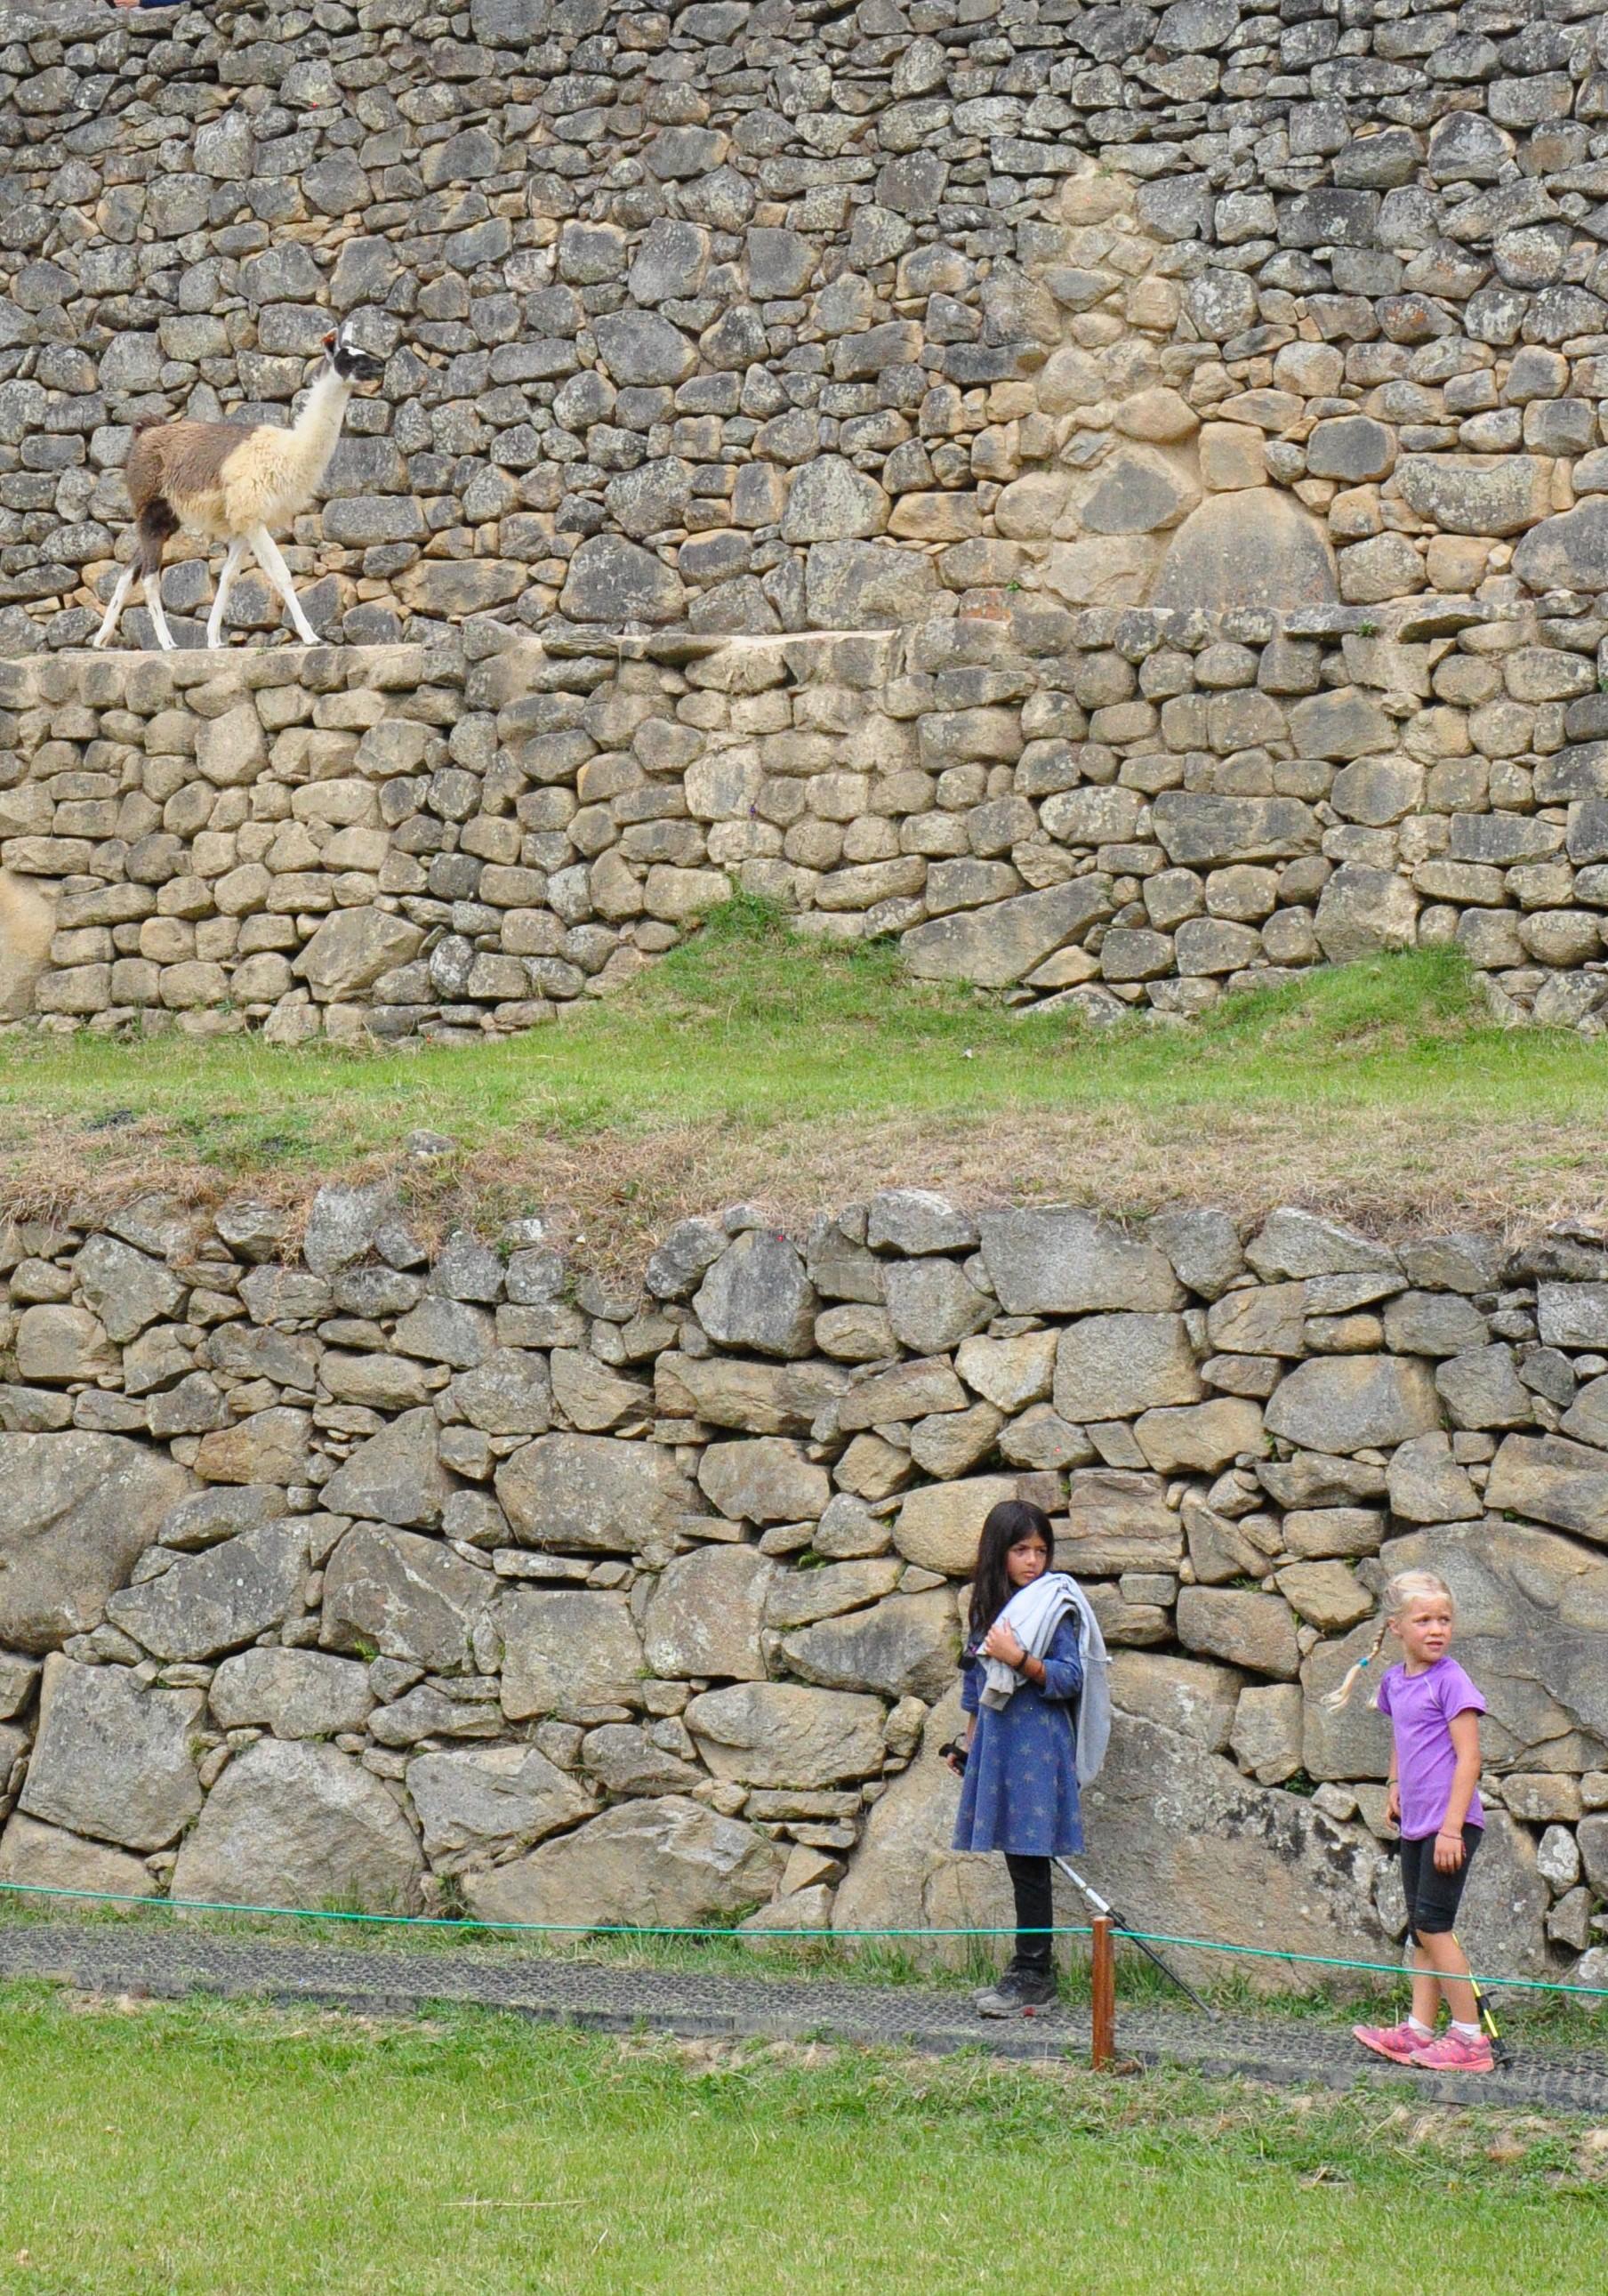 Llamas and beautiful children exploring the ruins